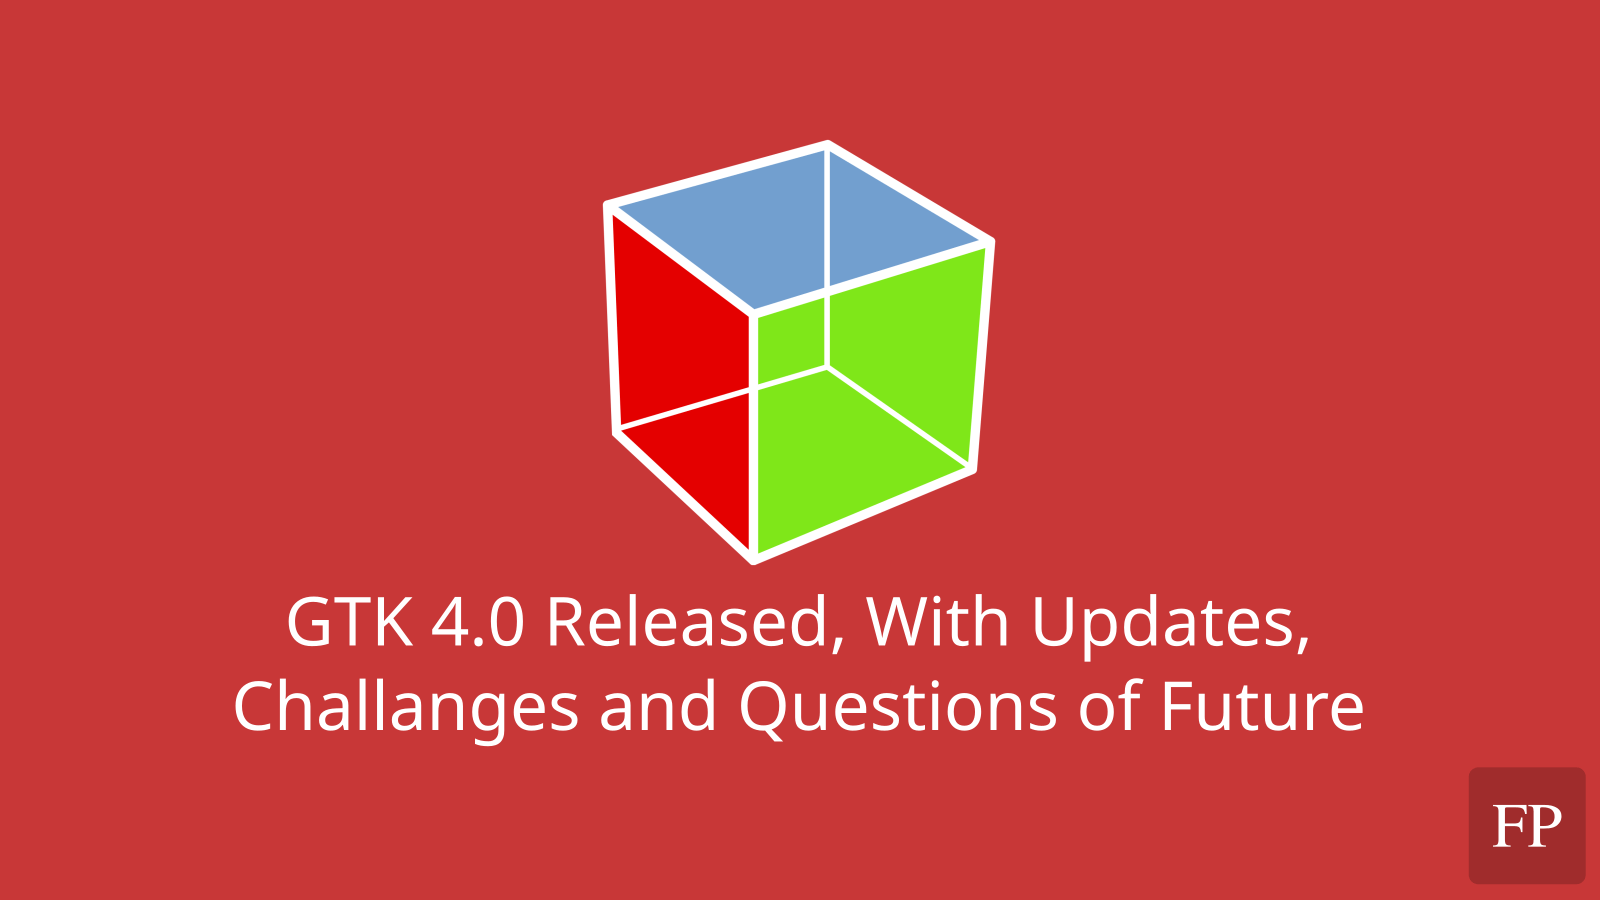 GTK 4.0 151 December 16, 2020